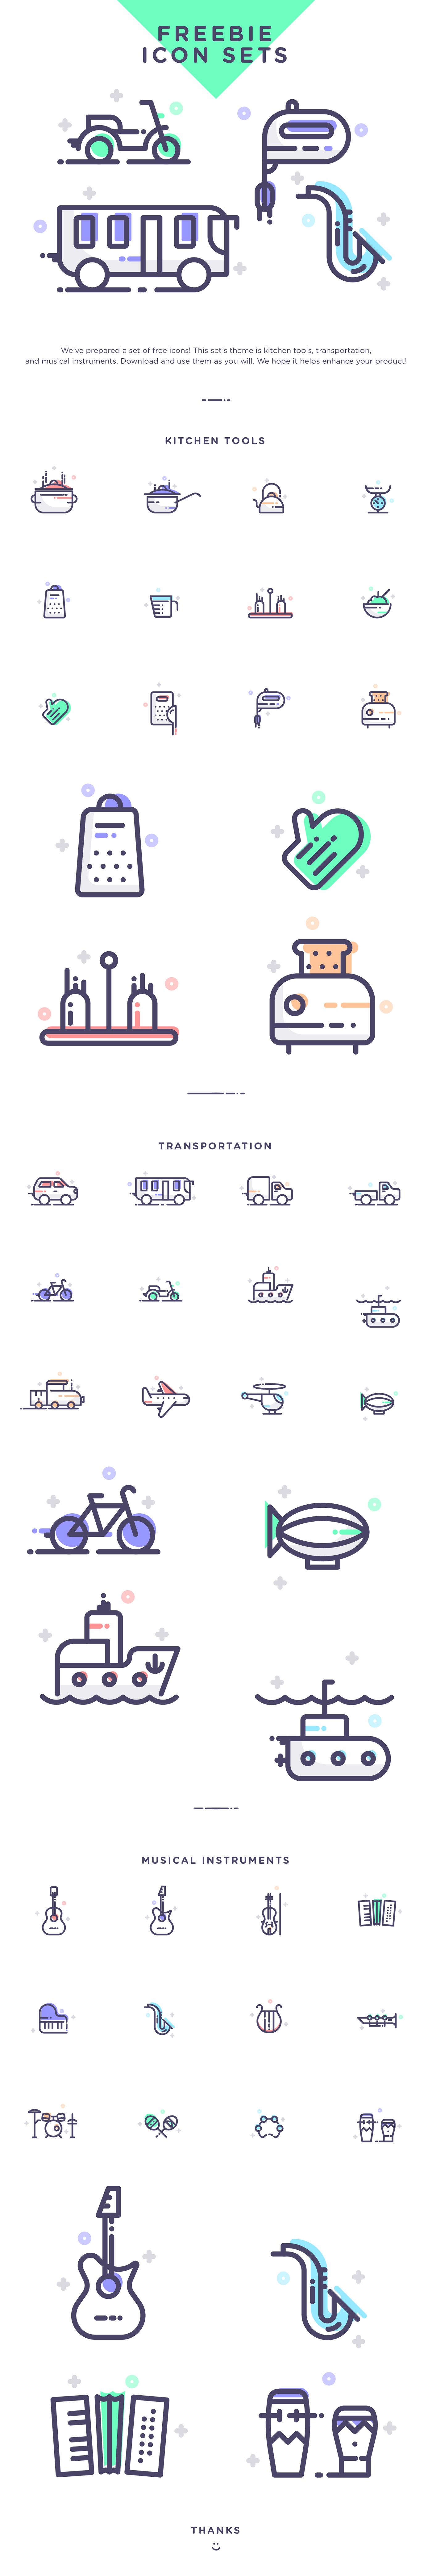 Icon free transportation kitchen tools Musical Instruments icon set music Travel